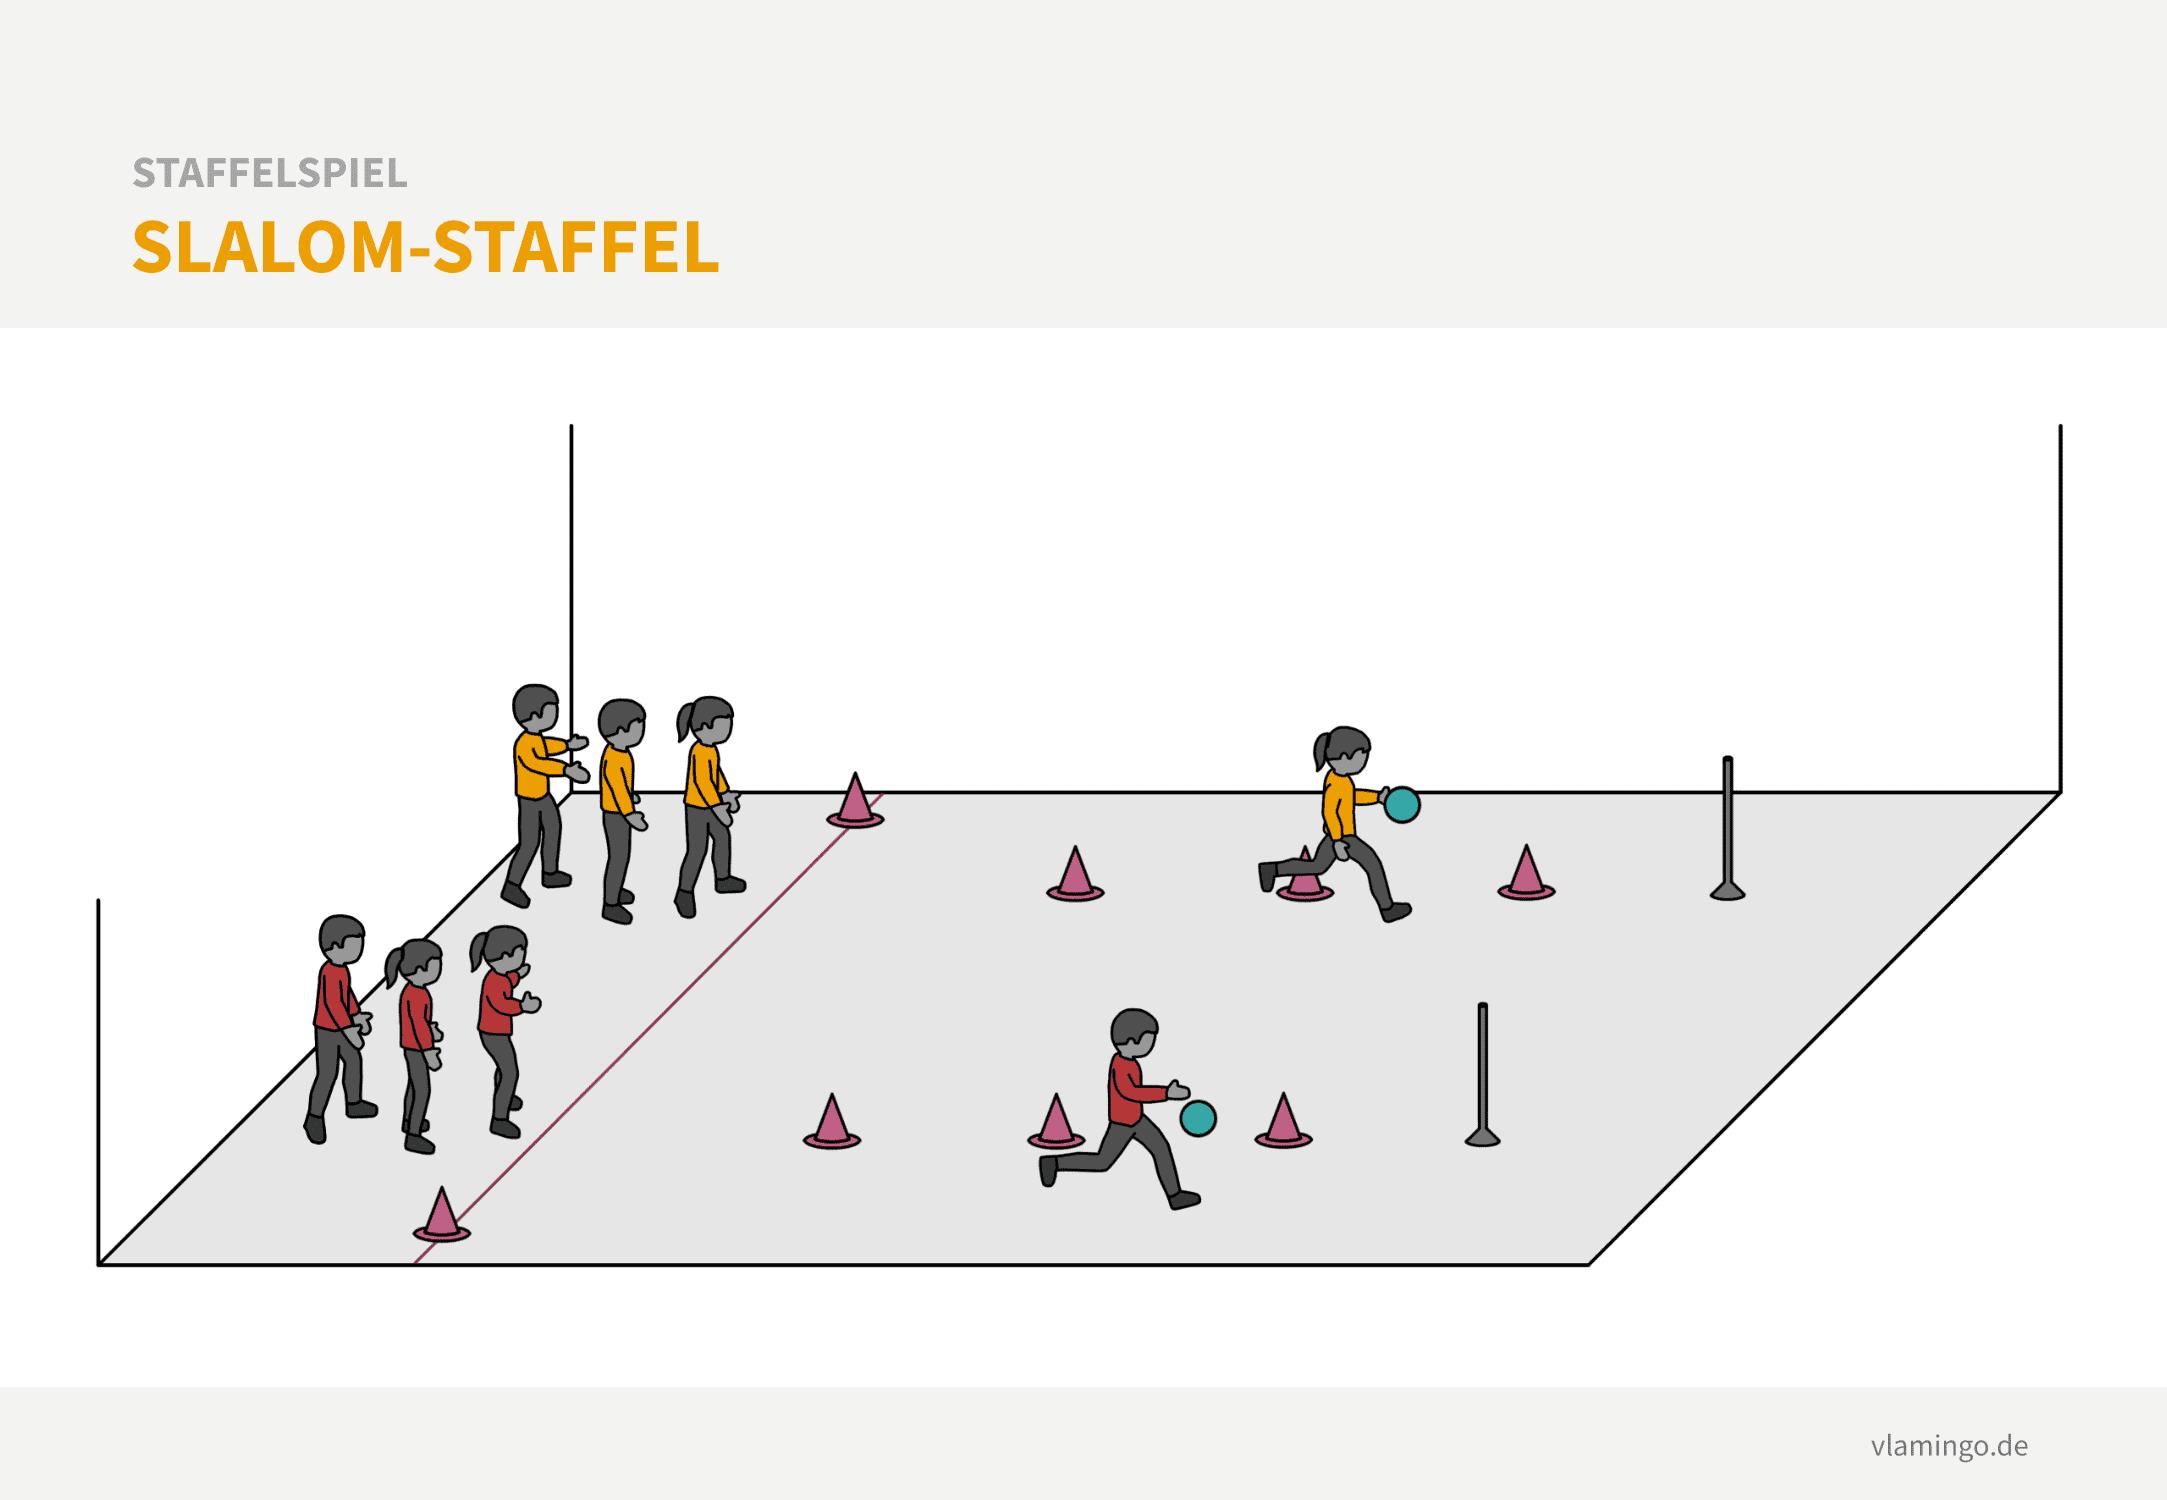 Staffelspiel - Slalom-Staffel